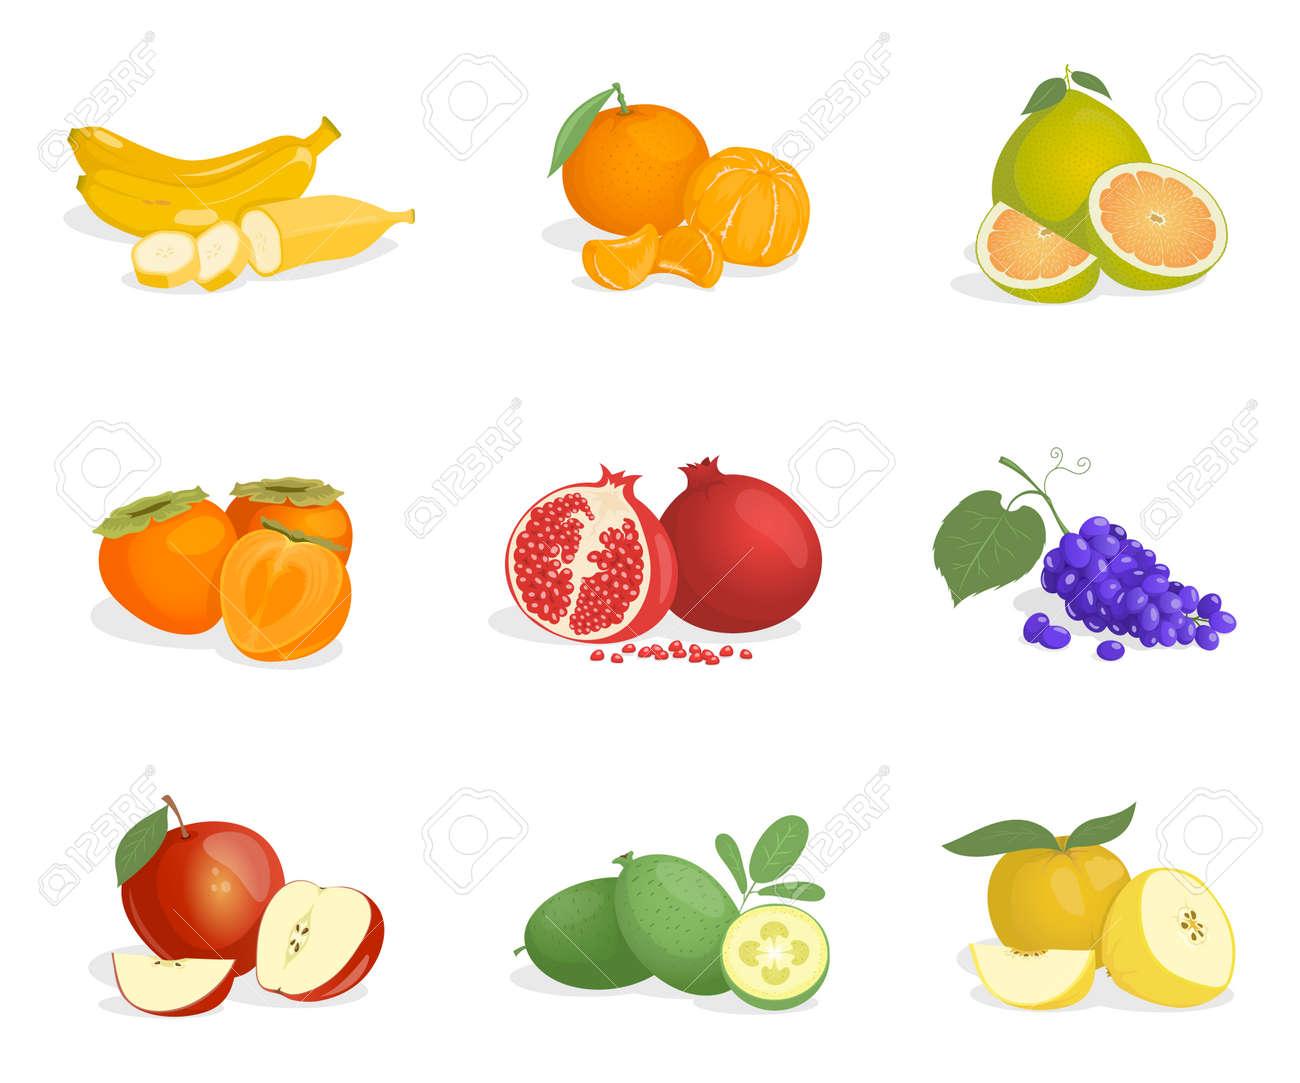 Banana, orange, guava, persimmon, pomegranate, grape, apple, pomelo, and feijoa vector cartoon illustrations. - 172122877